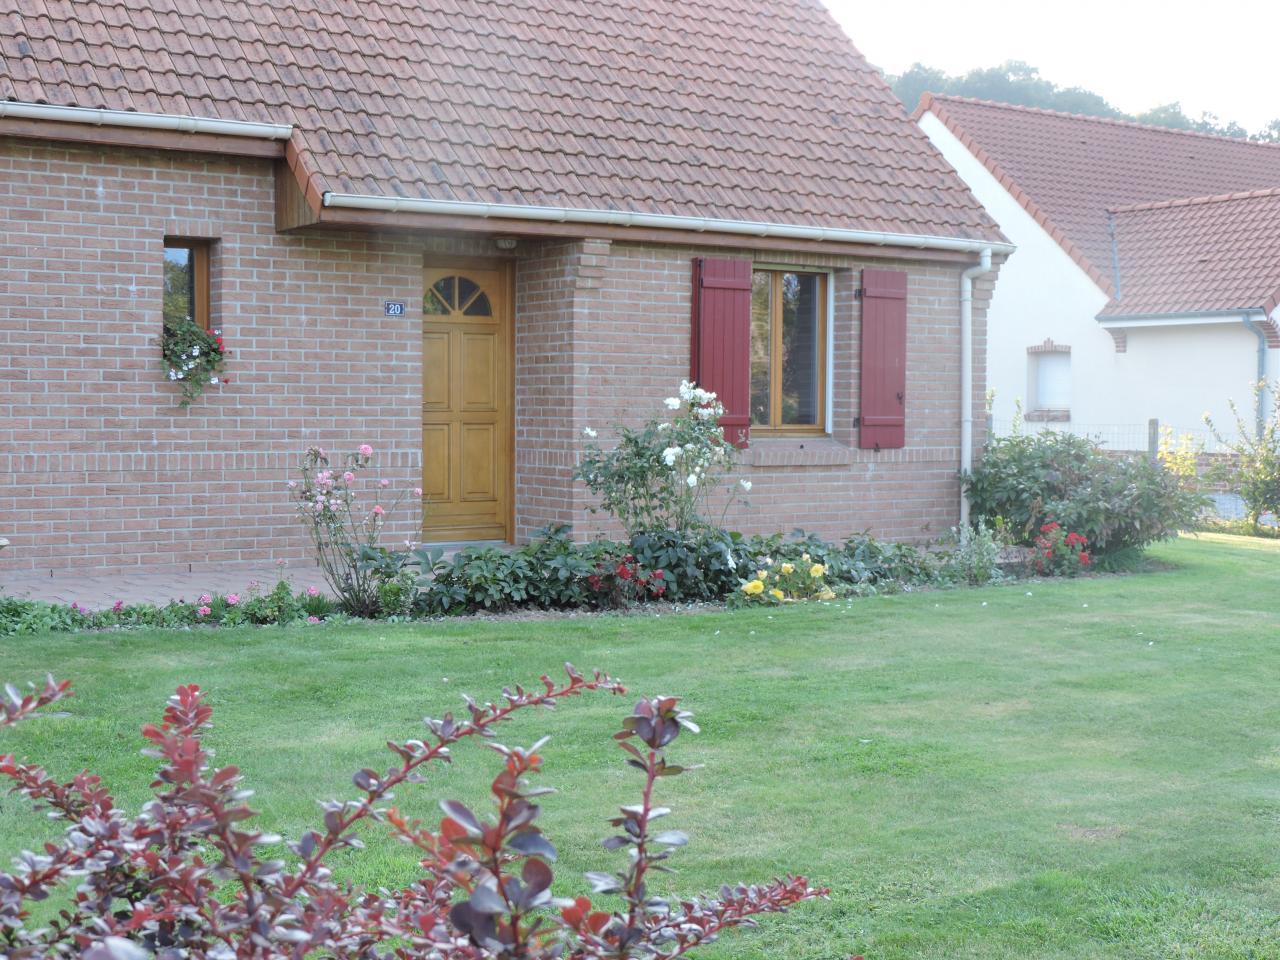 Maisons fleuries 2014 (19)